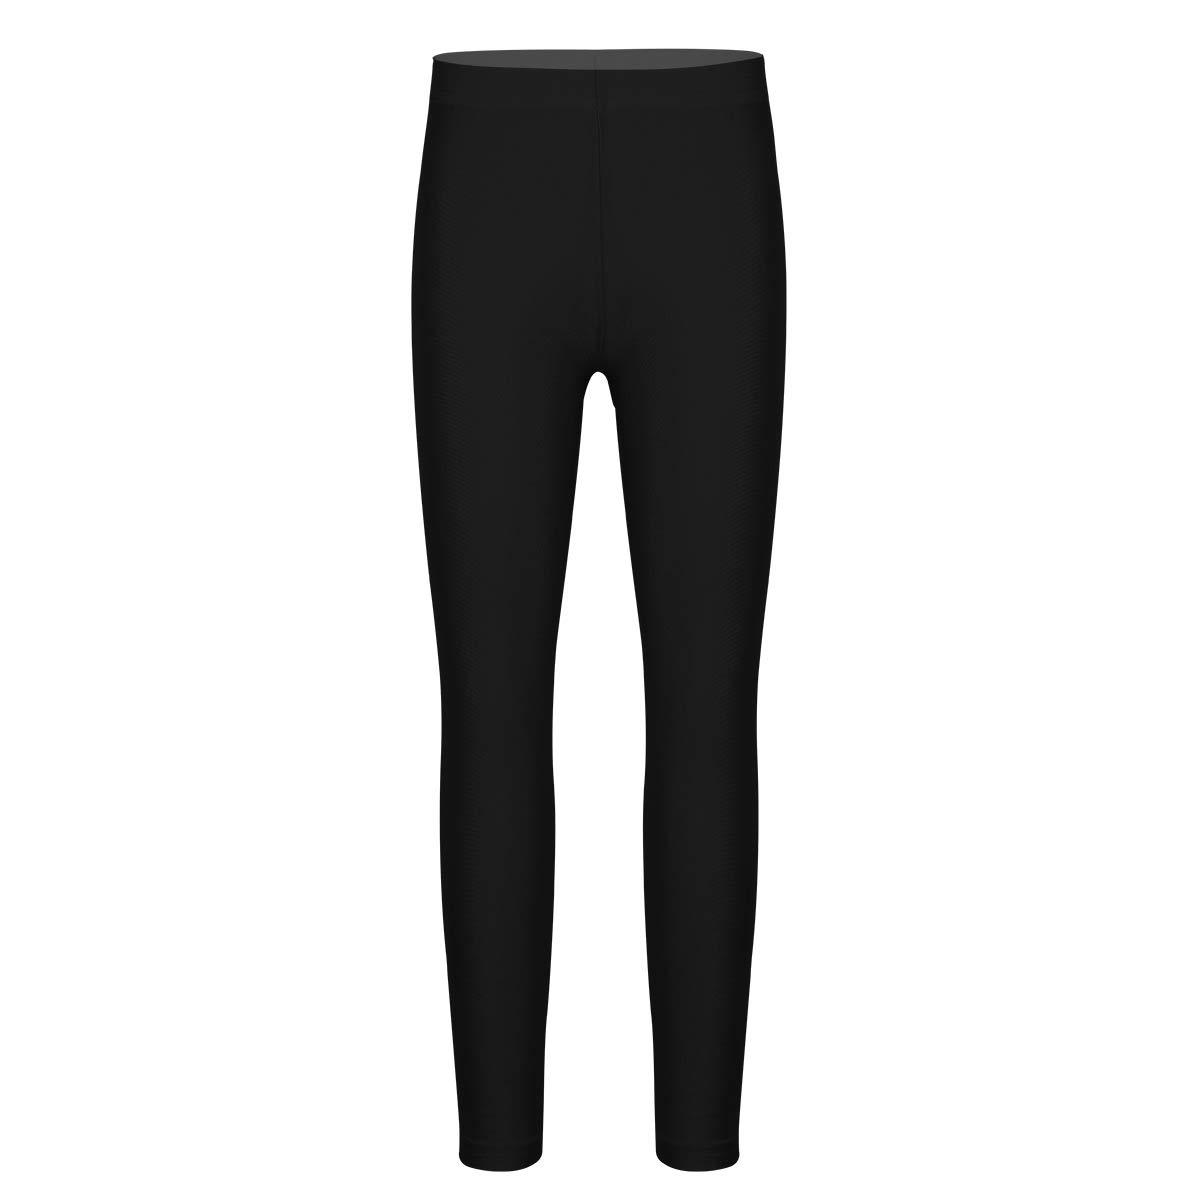 iEFiEL Boys Girls Stretchy Dance Tights Comfort Leggings Pants Yoga Gymnastics Ballet Stirrup Pantyhose for Kids Black Ankle Length 6-7